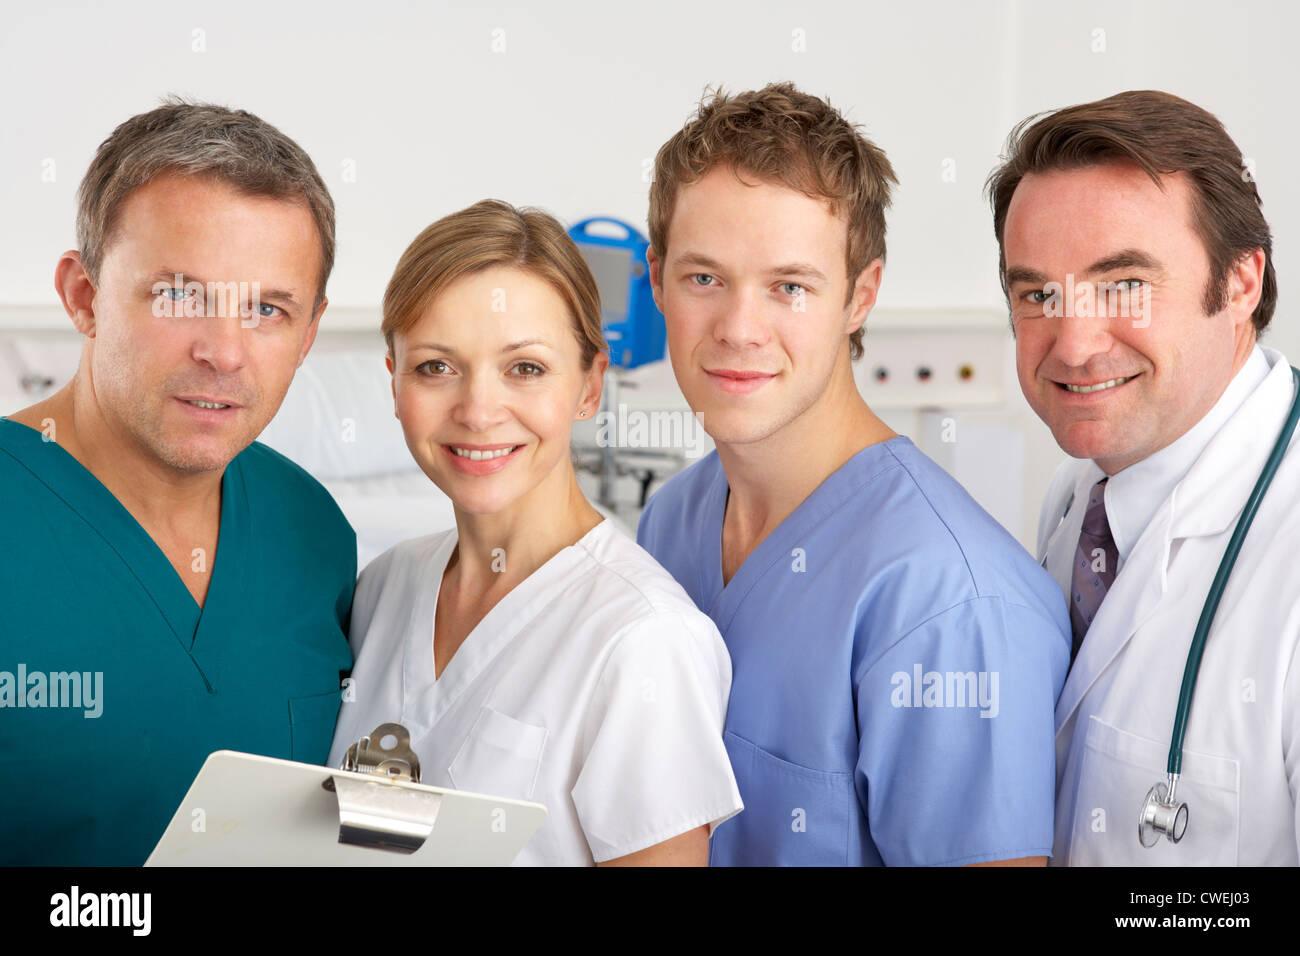 Portrait American medical team on hospital ward - Stock Image